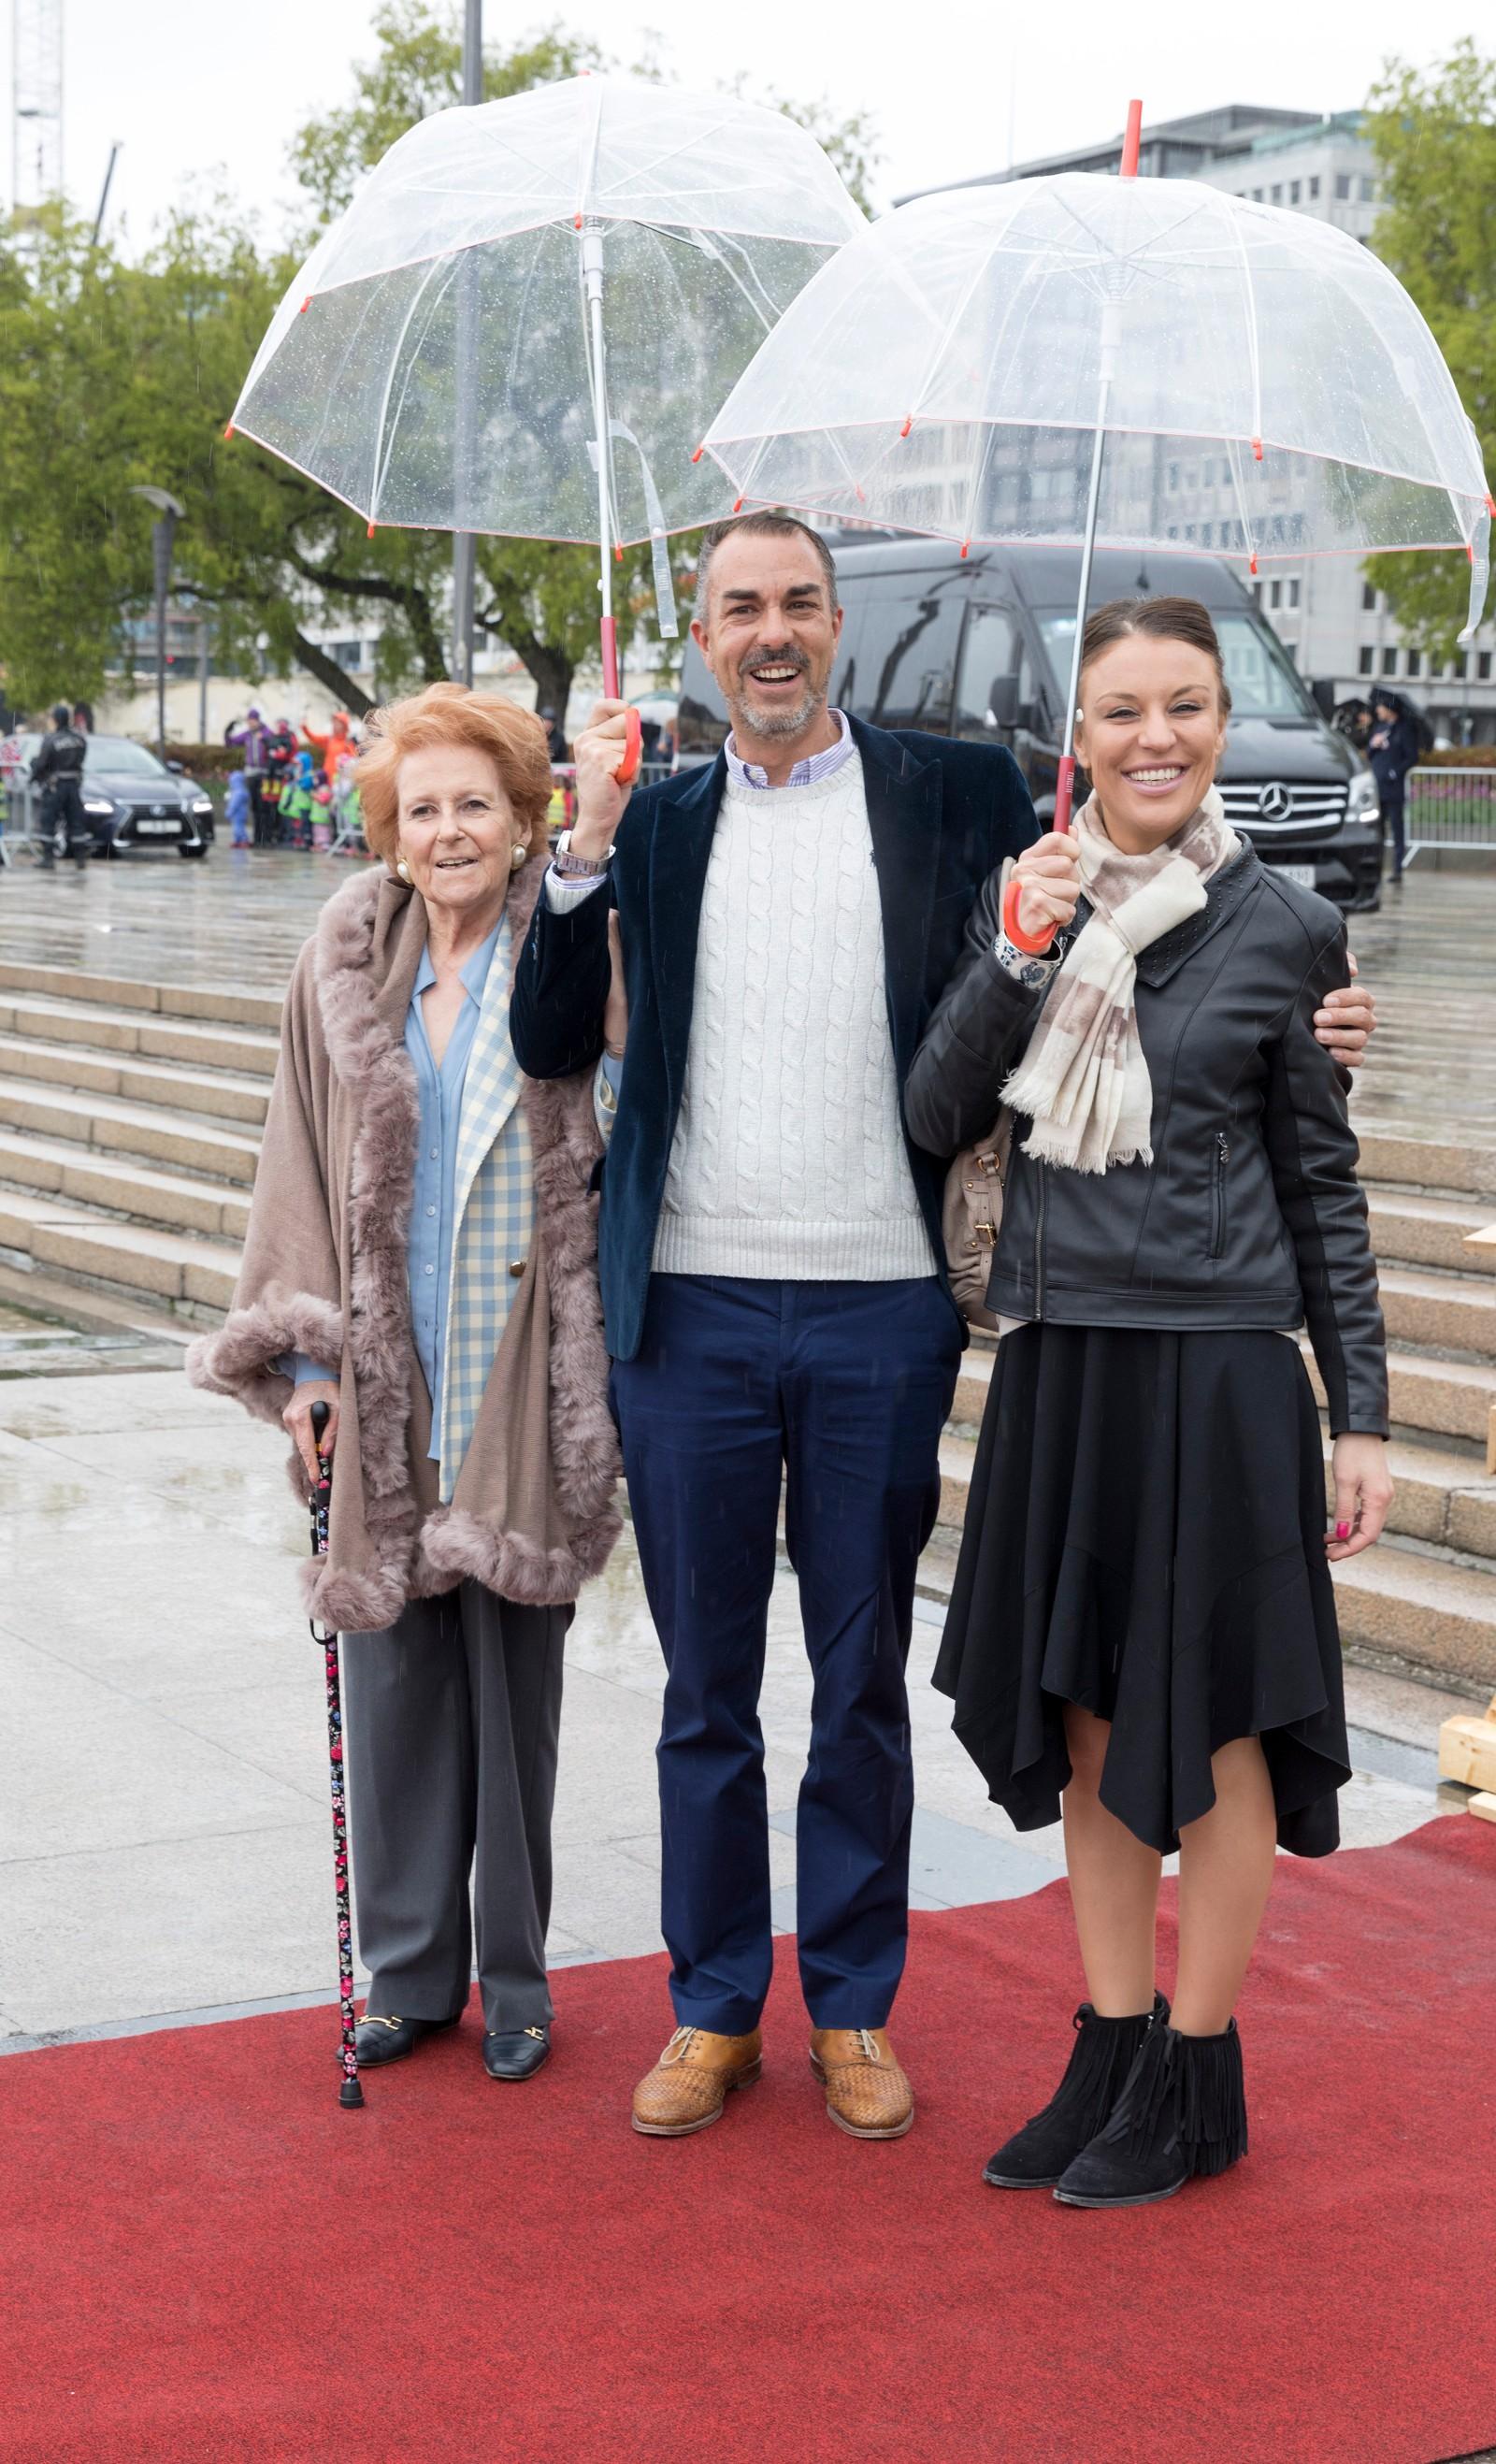 Lady Elizabeth Shakerley fra Storbritannia, Desirée Kogevinas og Carlos Eugster fra Sverige ved avreise fra honnørbrygga i Oslo på tur til lunsj på Kongeskipet Norge onsdag.